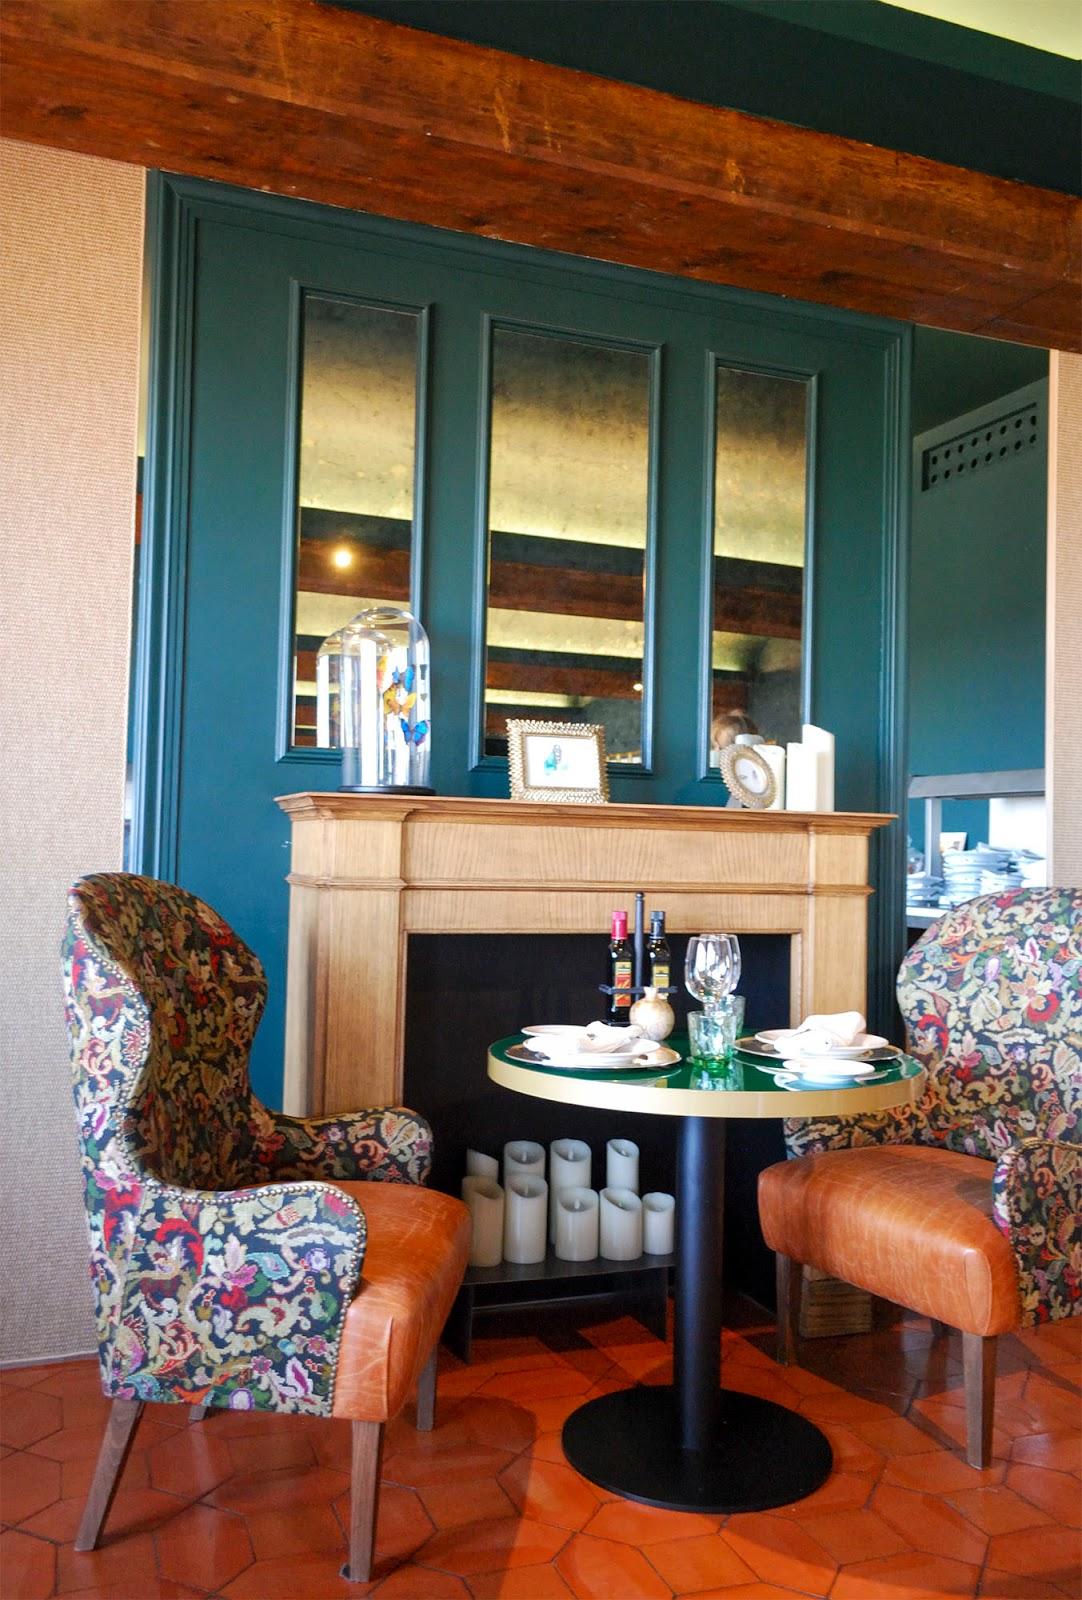 parador toledo spain hotel luxury restaurant vantage point restaurant